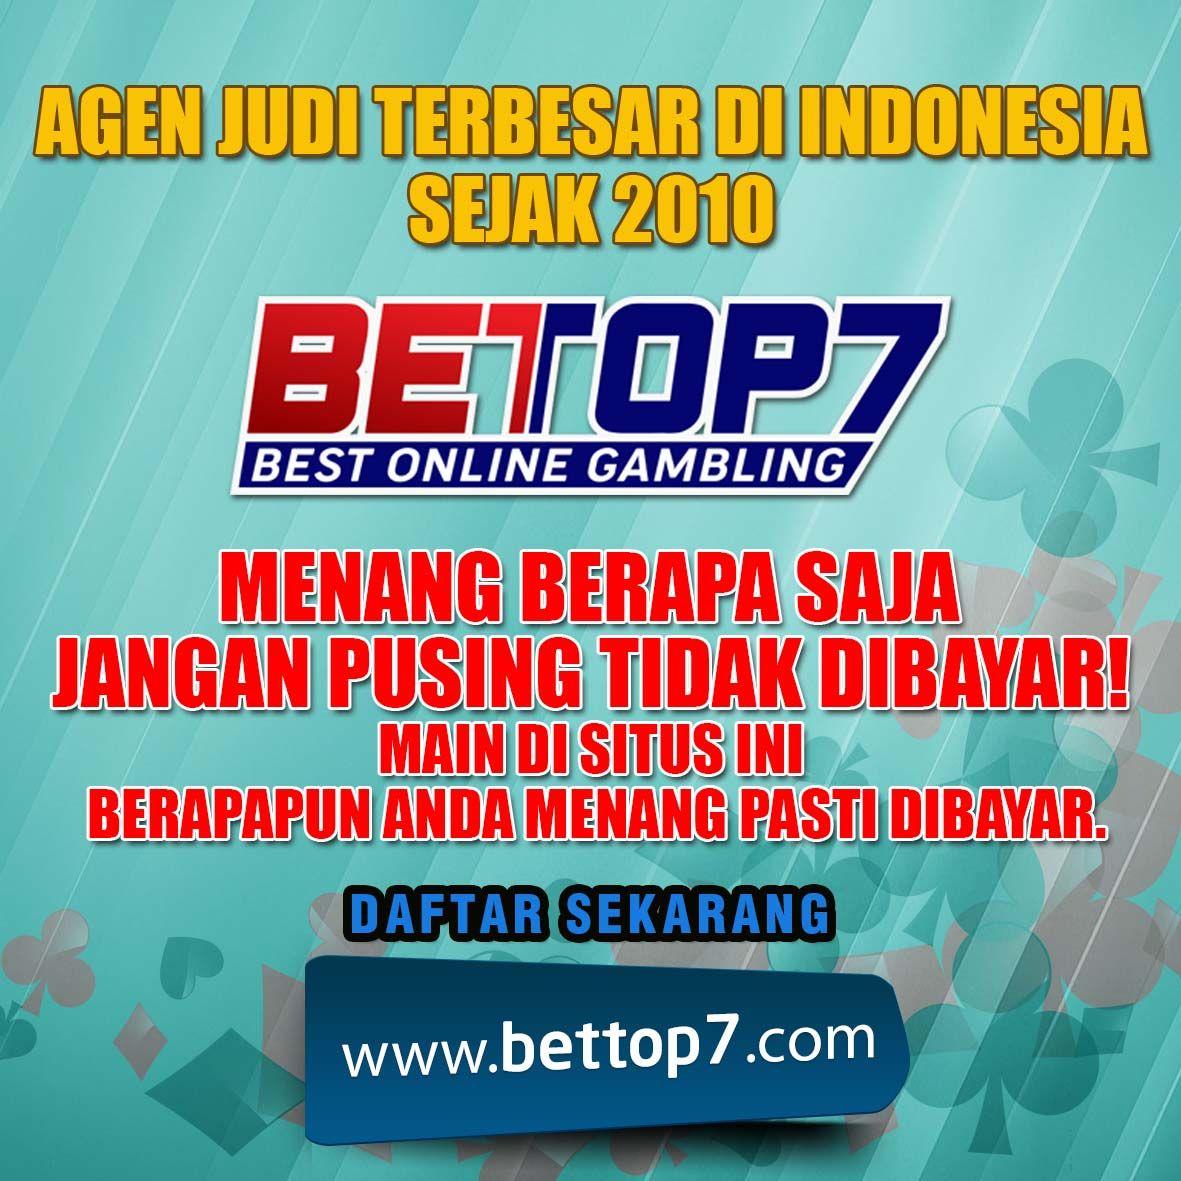 Pin On Bettop7 Com Agen Judi 2019 Terpercaya Di Indonesia